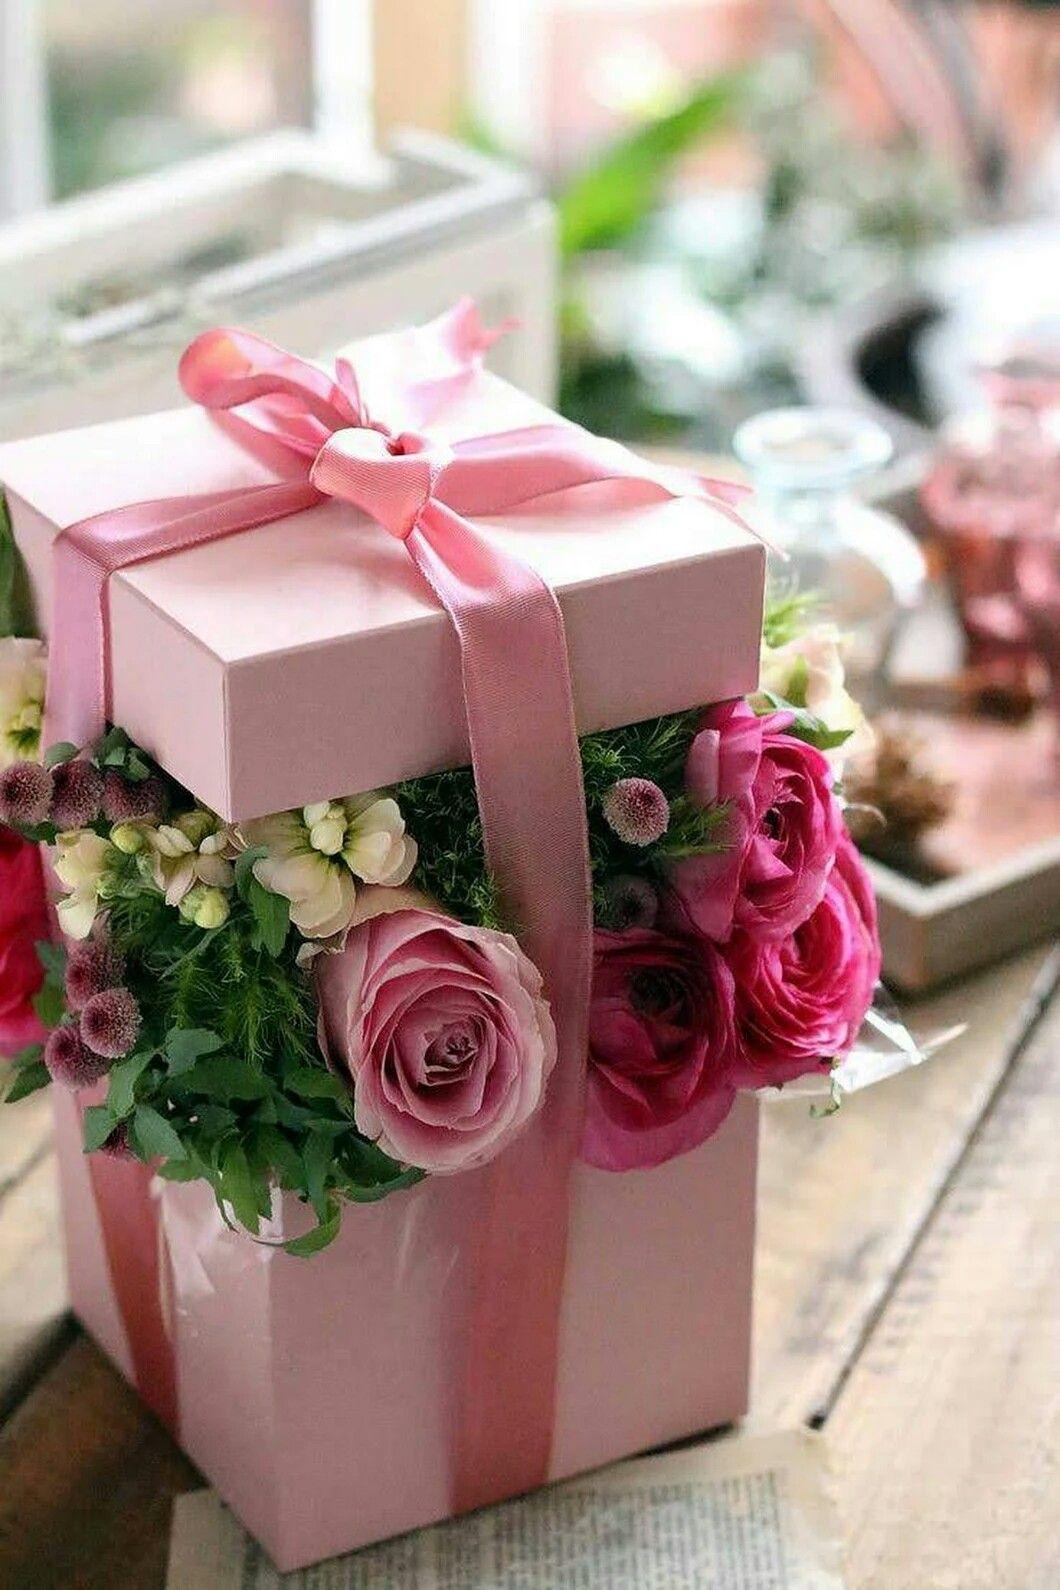 هديه زواج Happy Birthday Flower Birthday Bouquet Flowers Bouquet Gift